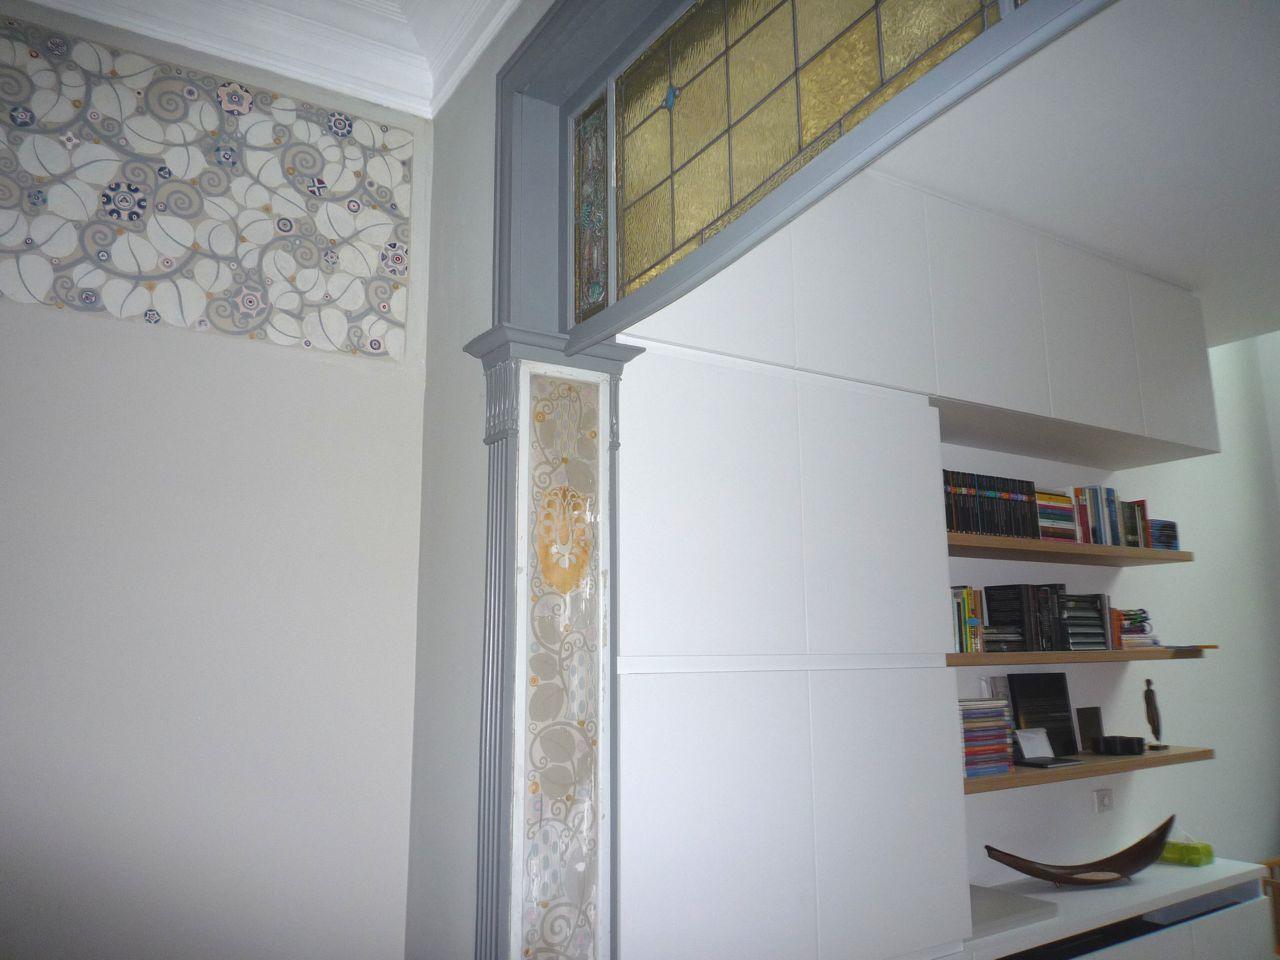 P1050586 | Baeyens & Beck architecten Gent | architect nieuwbouw renovatie interieur | high end | architectenbureau